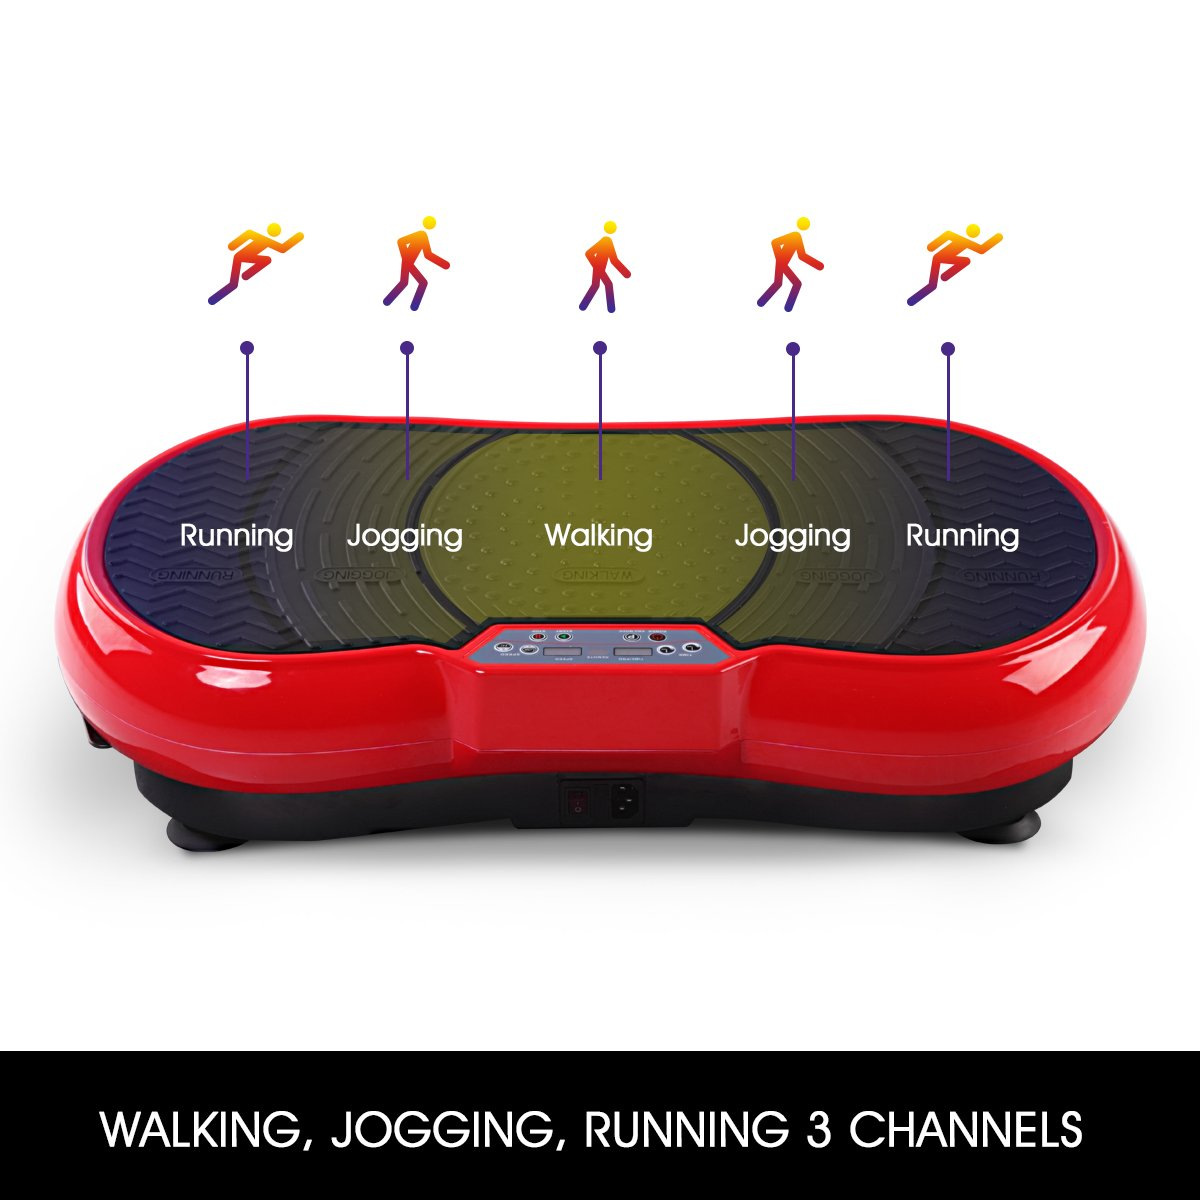 GENKI Fitness Vibration Platform Workout Machine Whole Full Body Shape Exercise Training Power Plate (Red) by GENKI (Image #3)